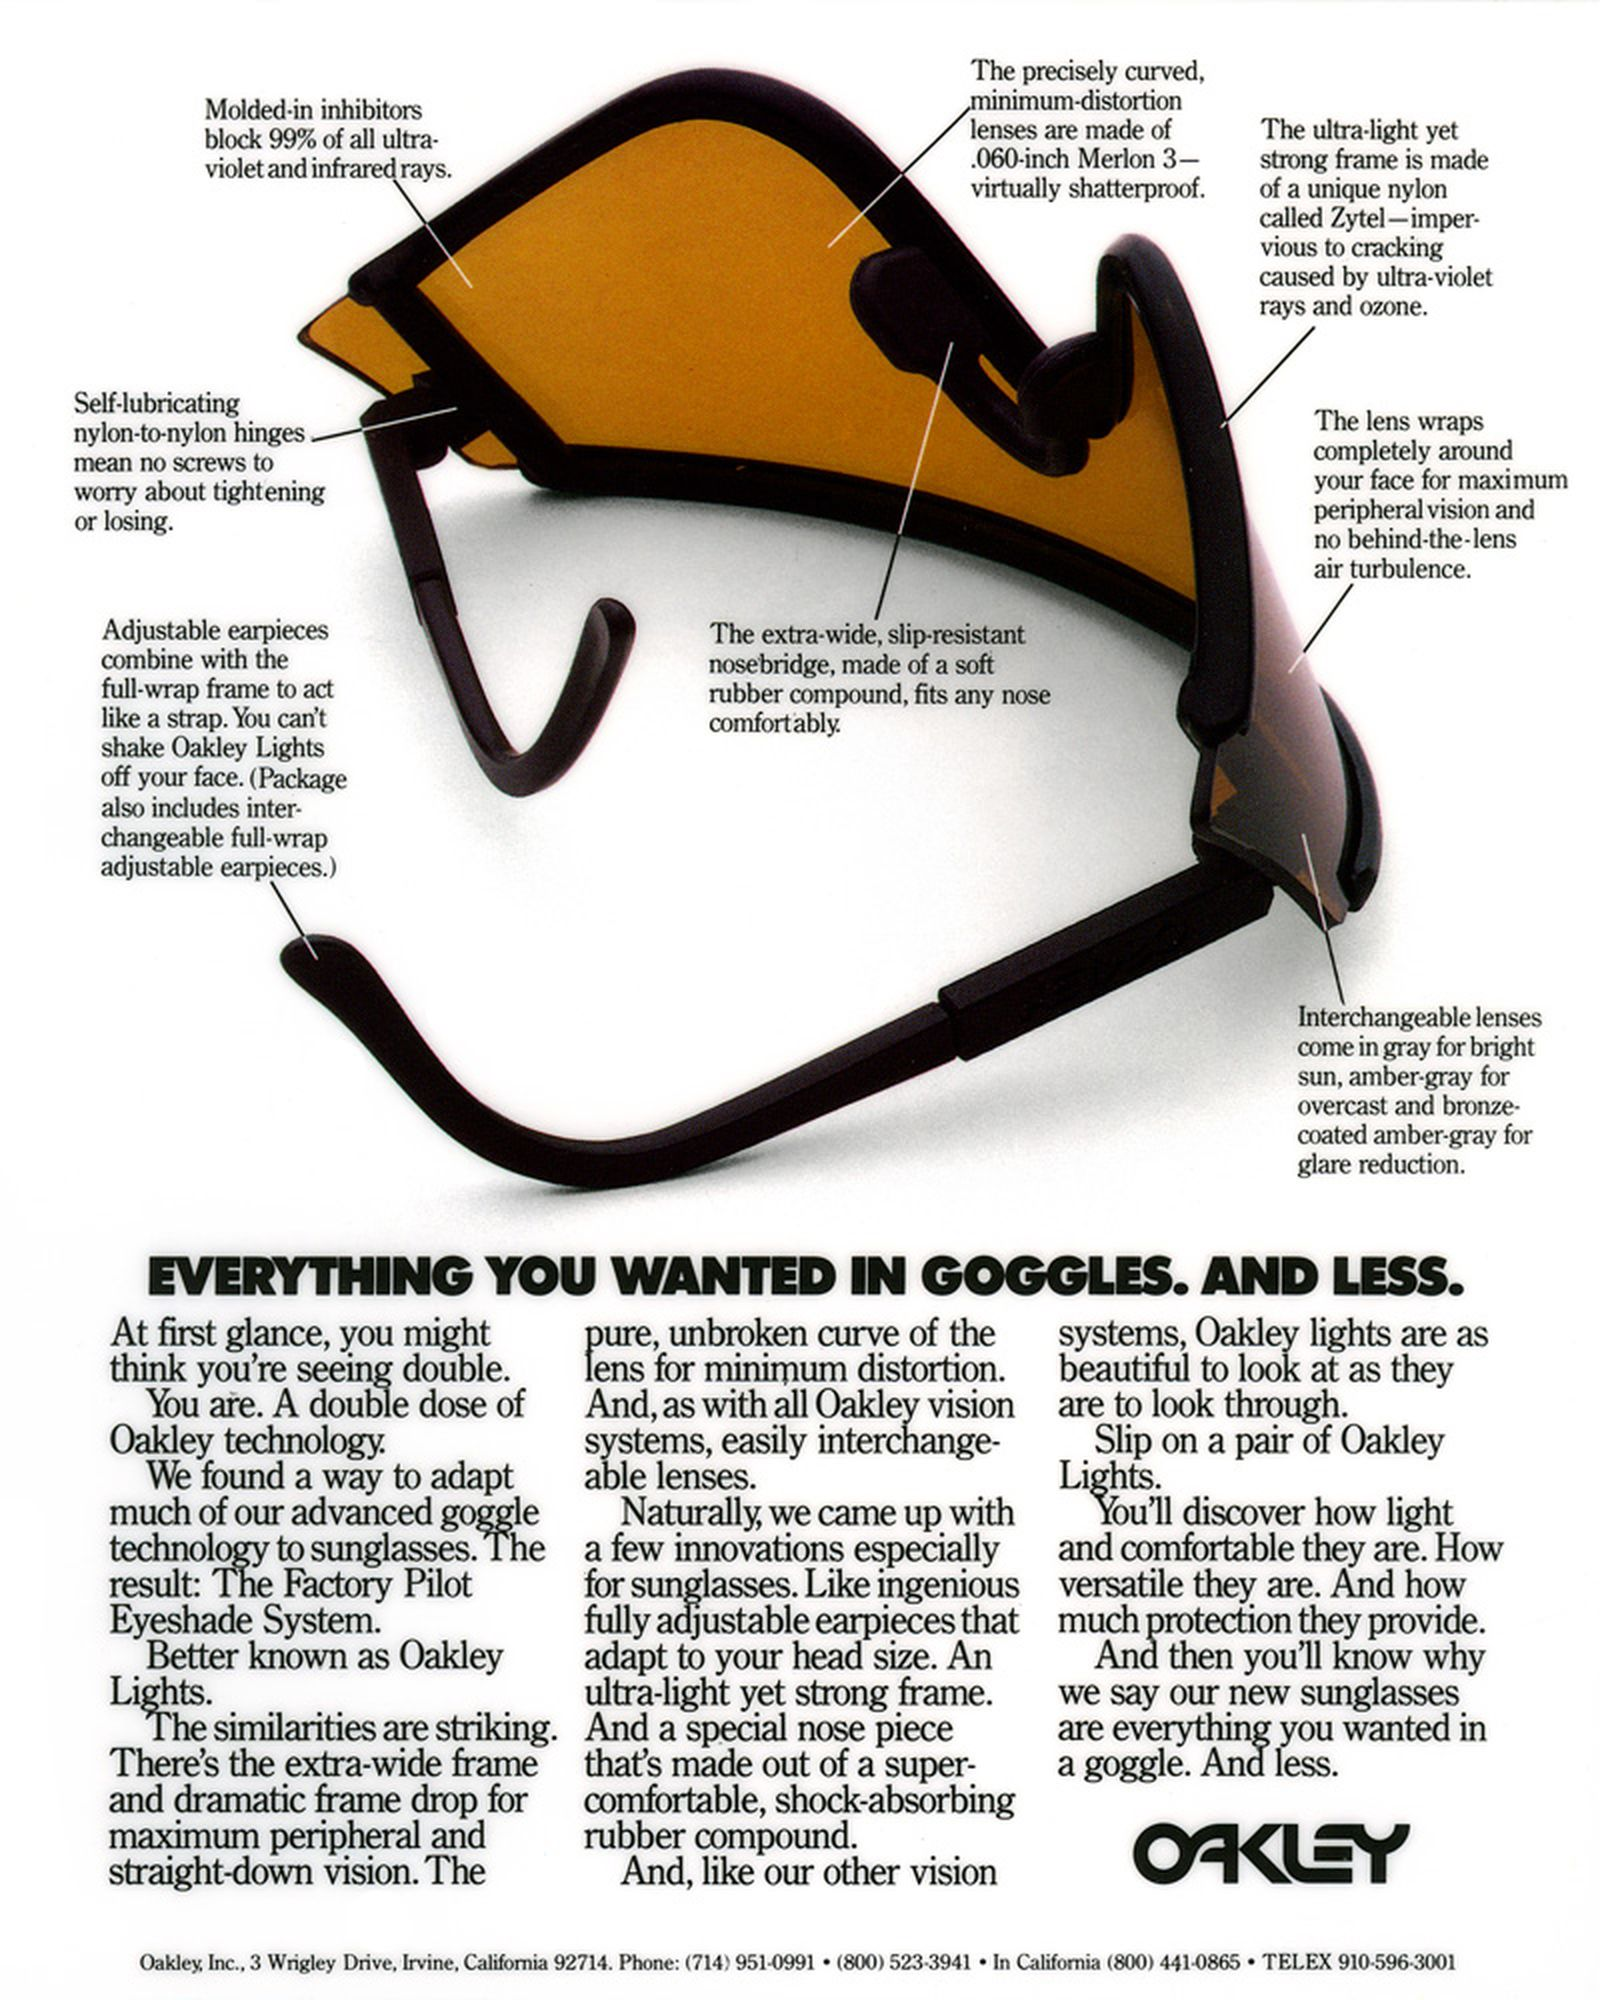 historical-clarity-oakleys-lens-tech-keeps-getting-sharper-03